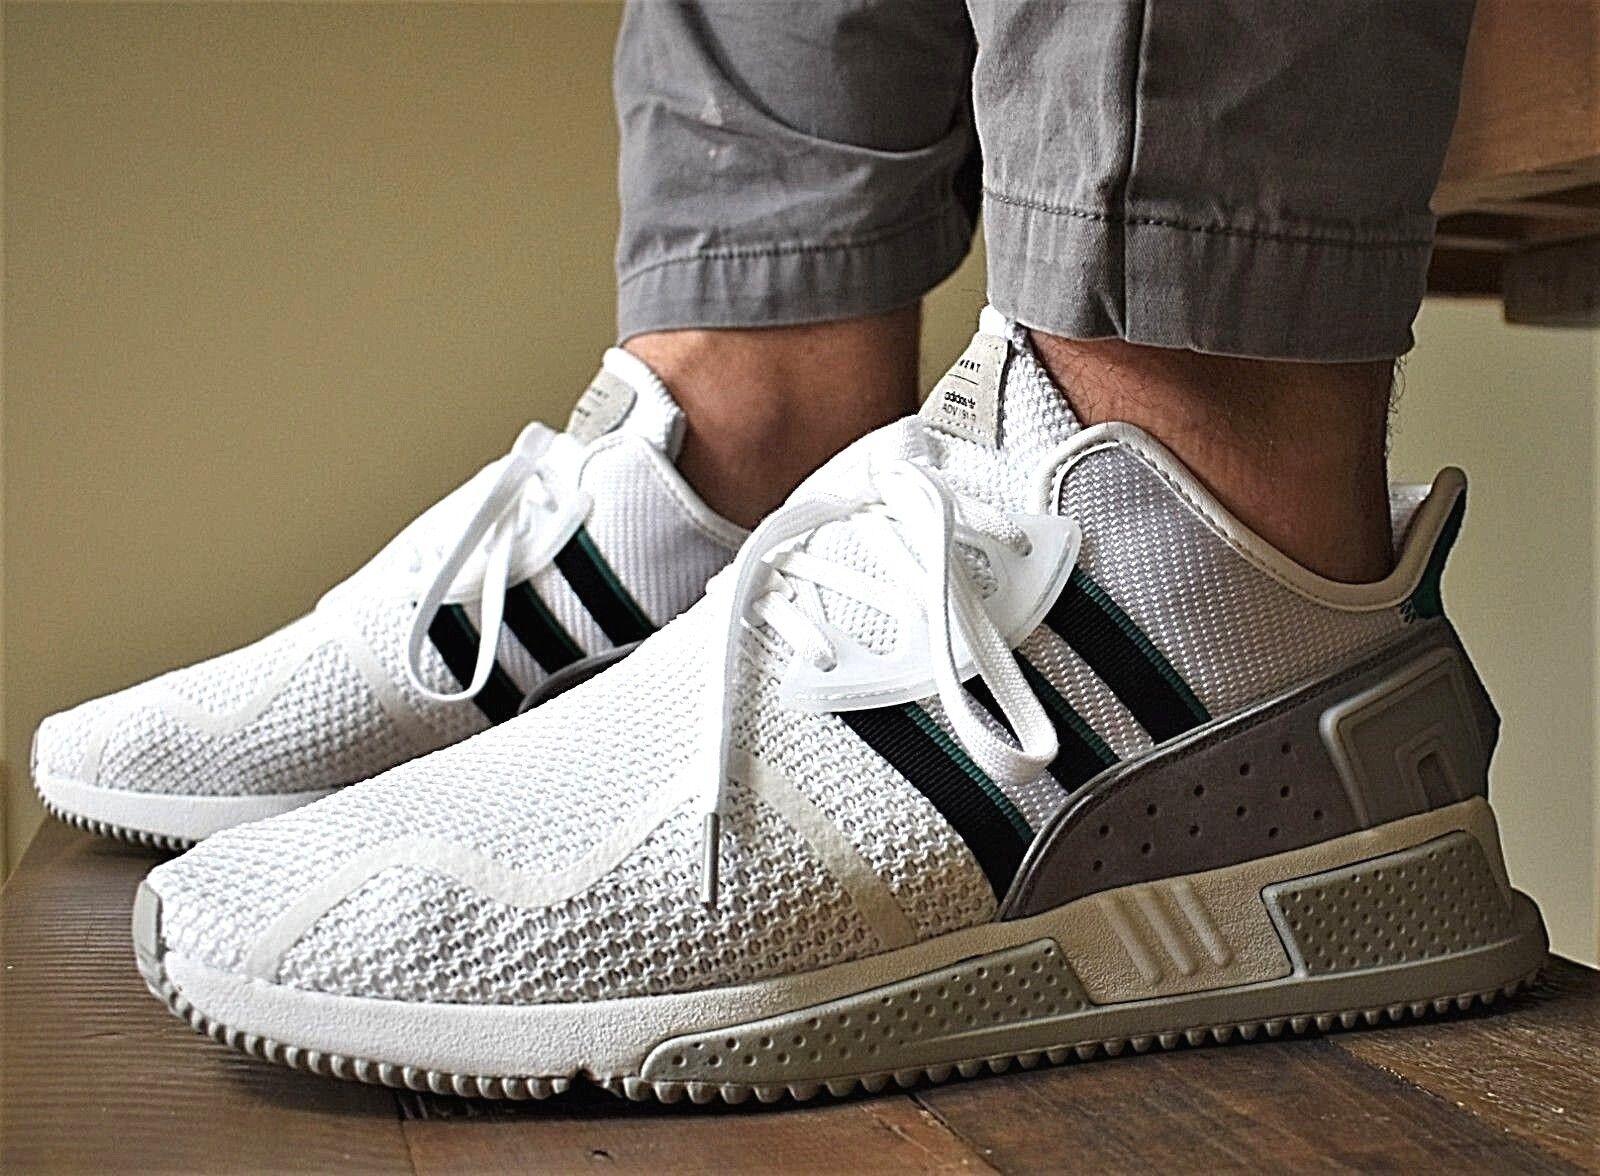 Adidas Originals EQT Cushion ADV New Men's Casual shoes White Green BB7178